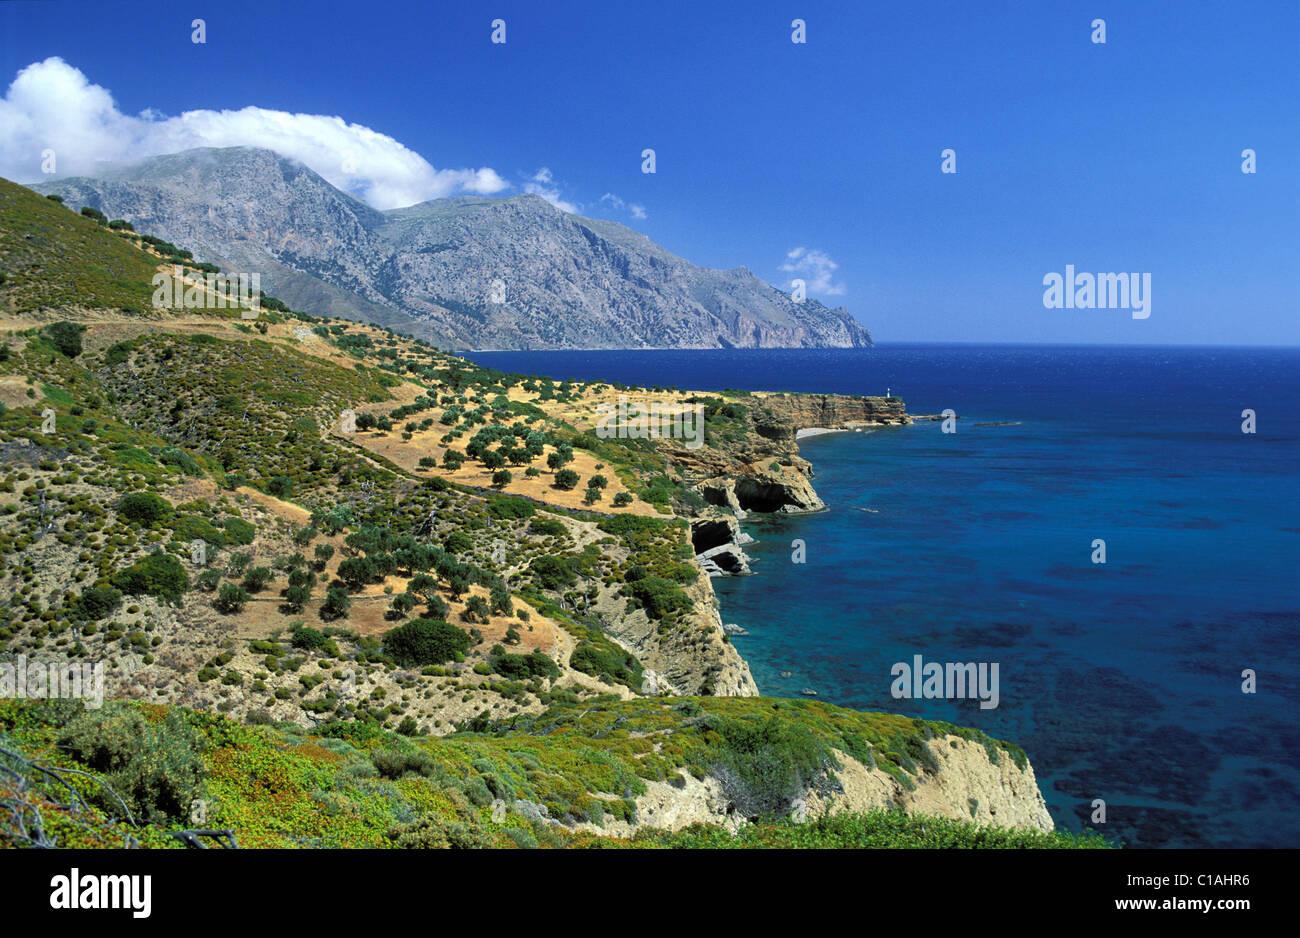 Greece, the Dodecanese, Karpathos Island, the coast Stock Photo